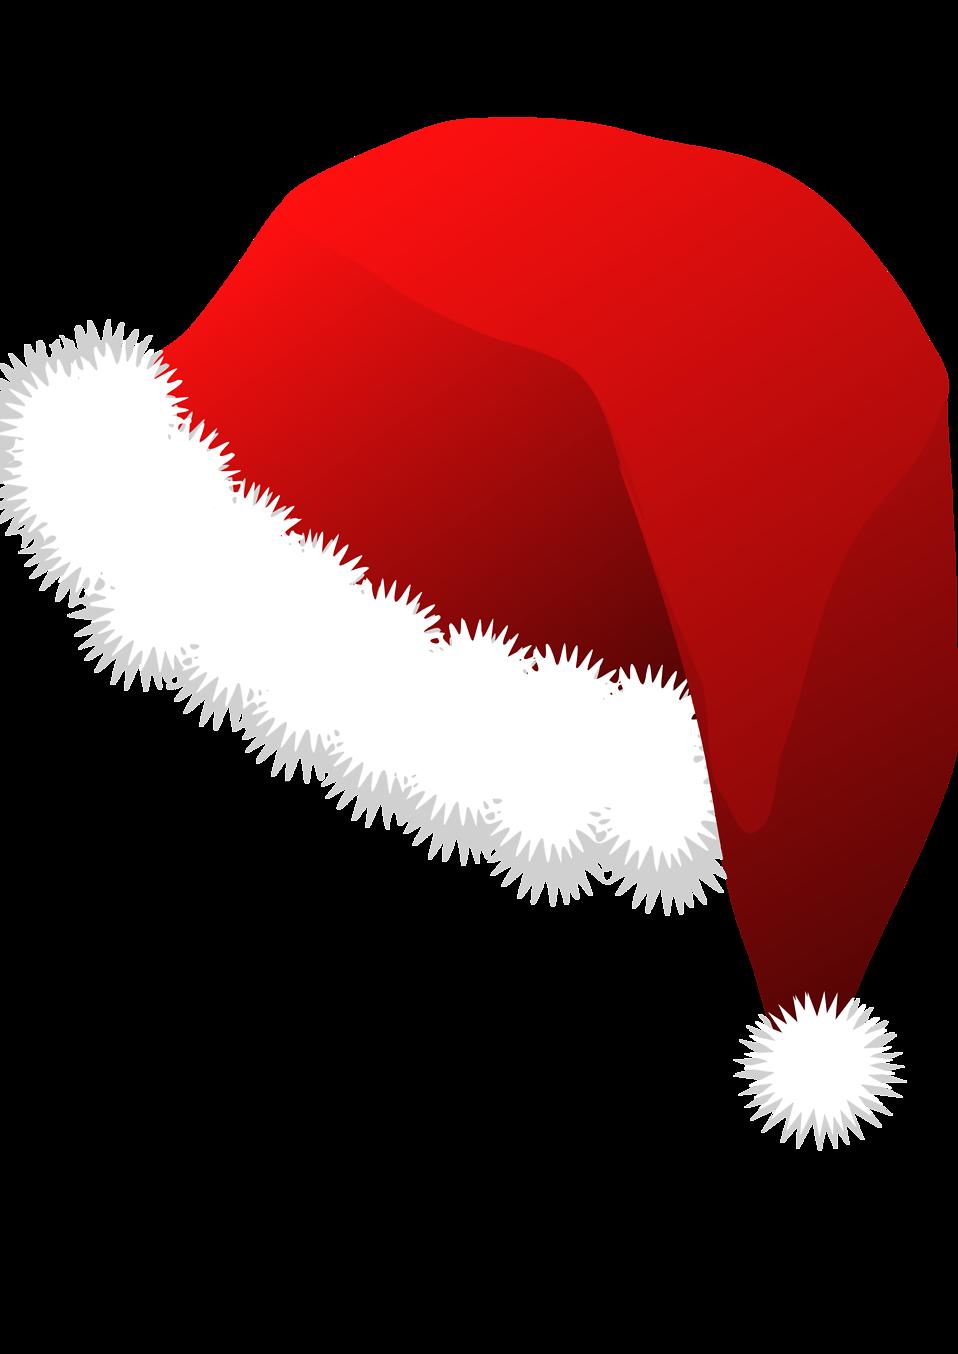 Santa hat clipart transparent background 2 » Clipart Station.